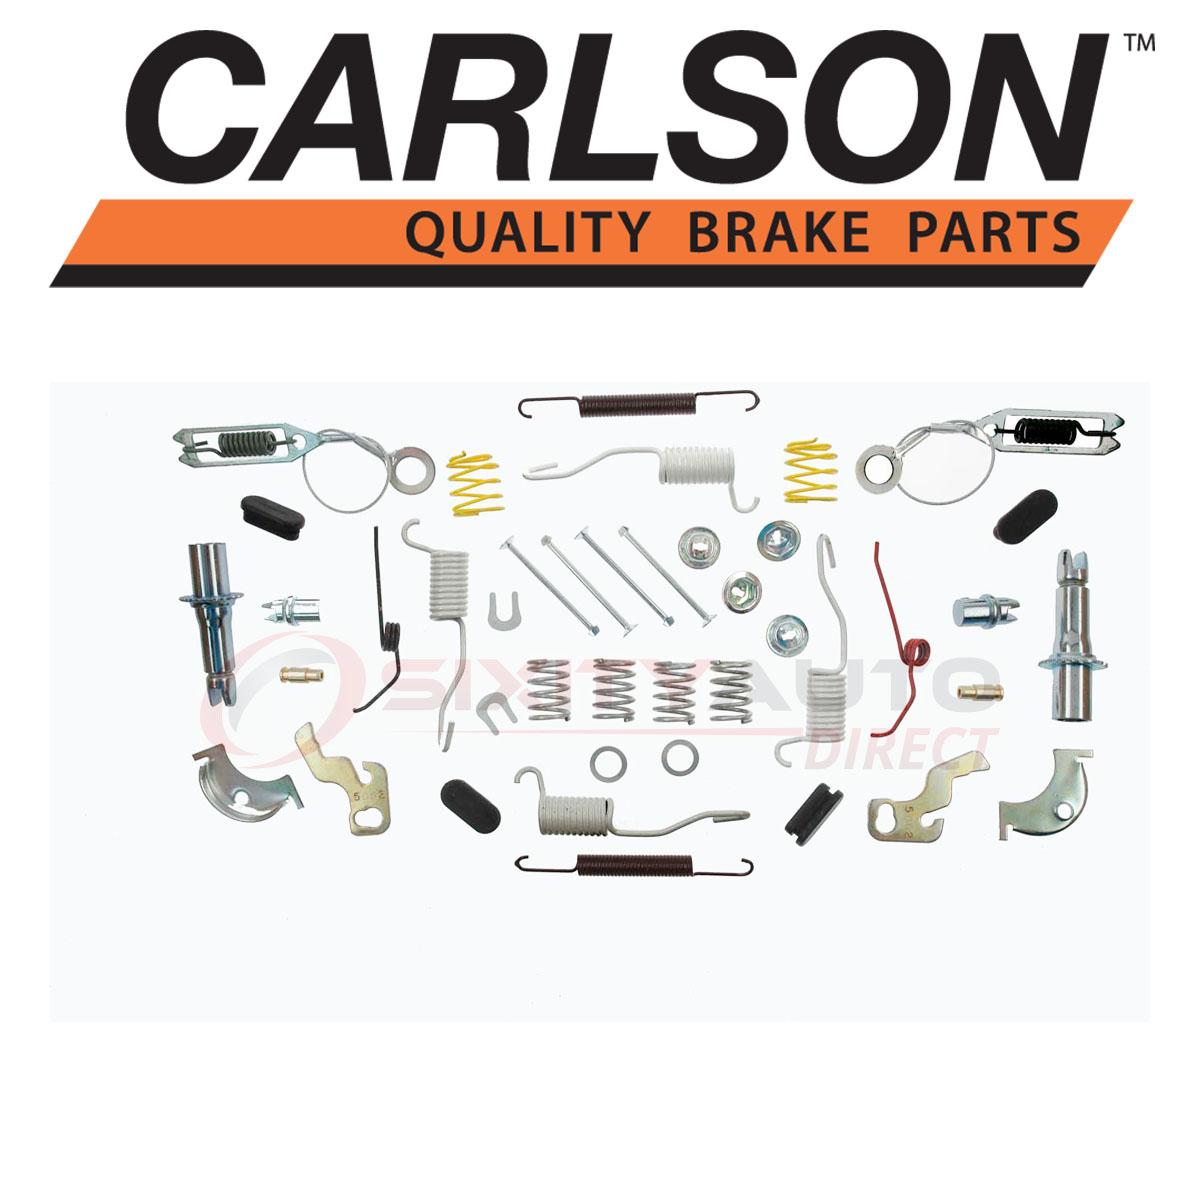 Carlson Rear Drum Brake Hardware Kit for 1990-2006 Jeep Wrangler Shoe yn